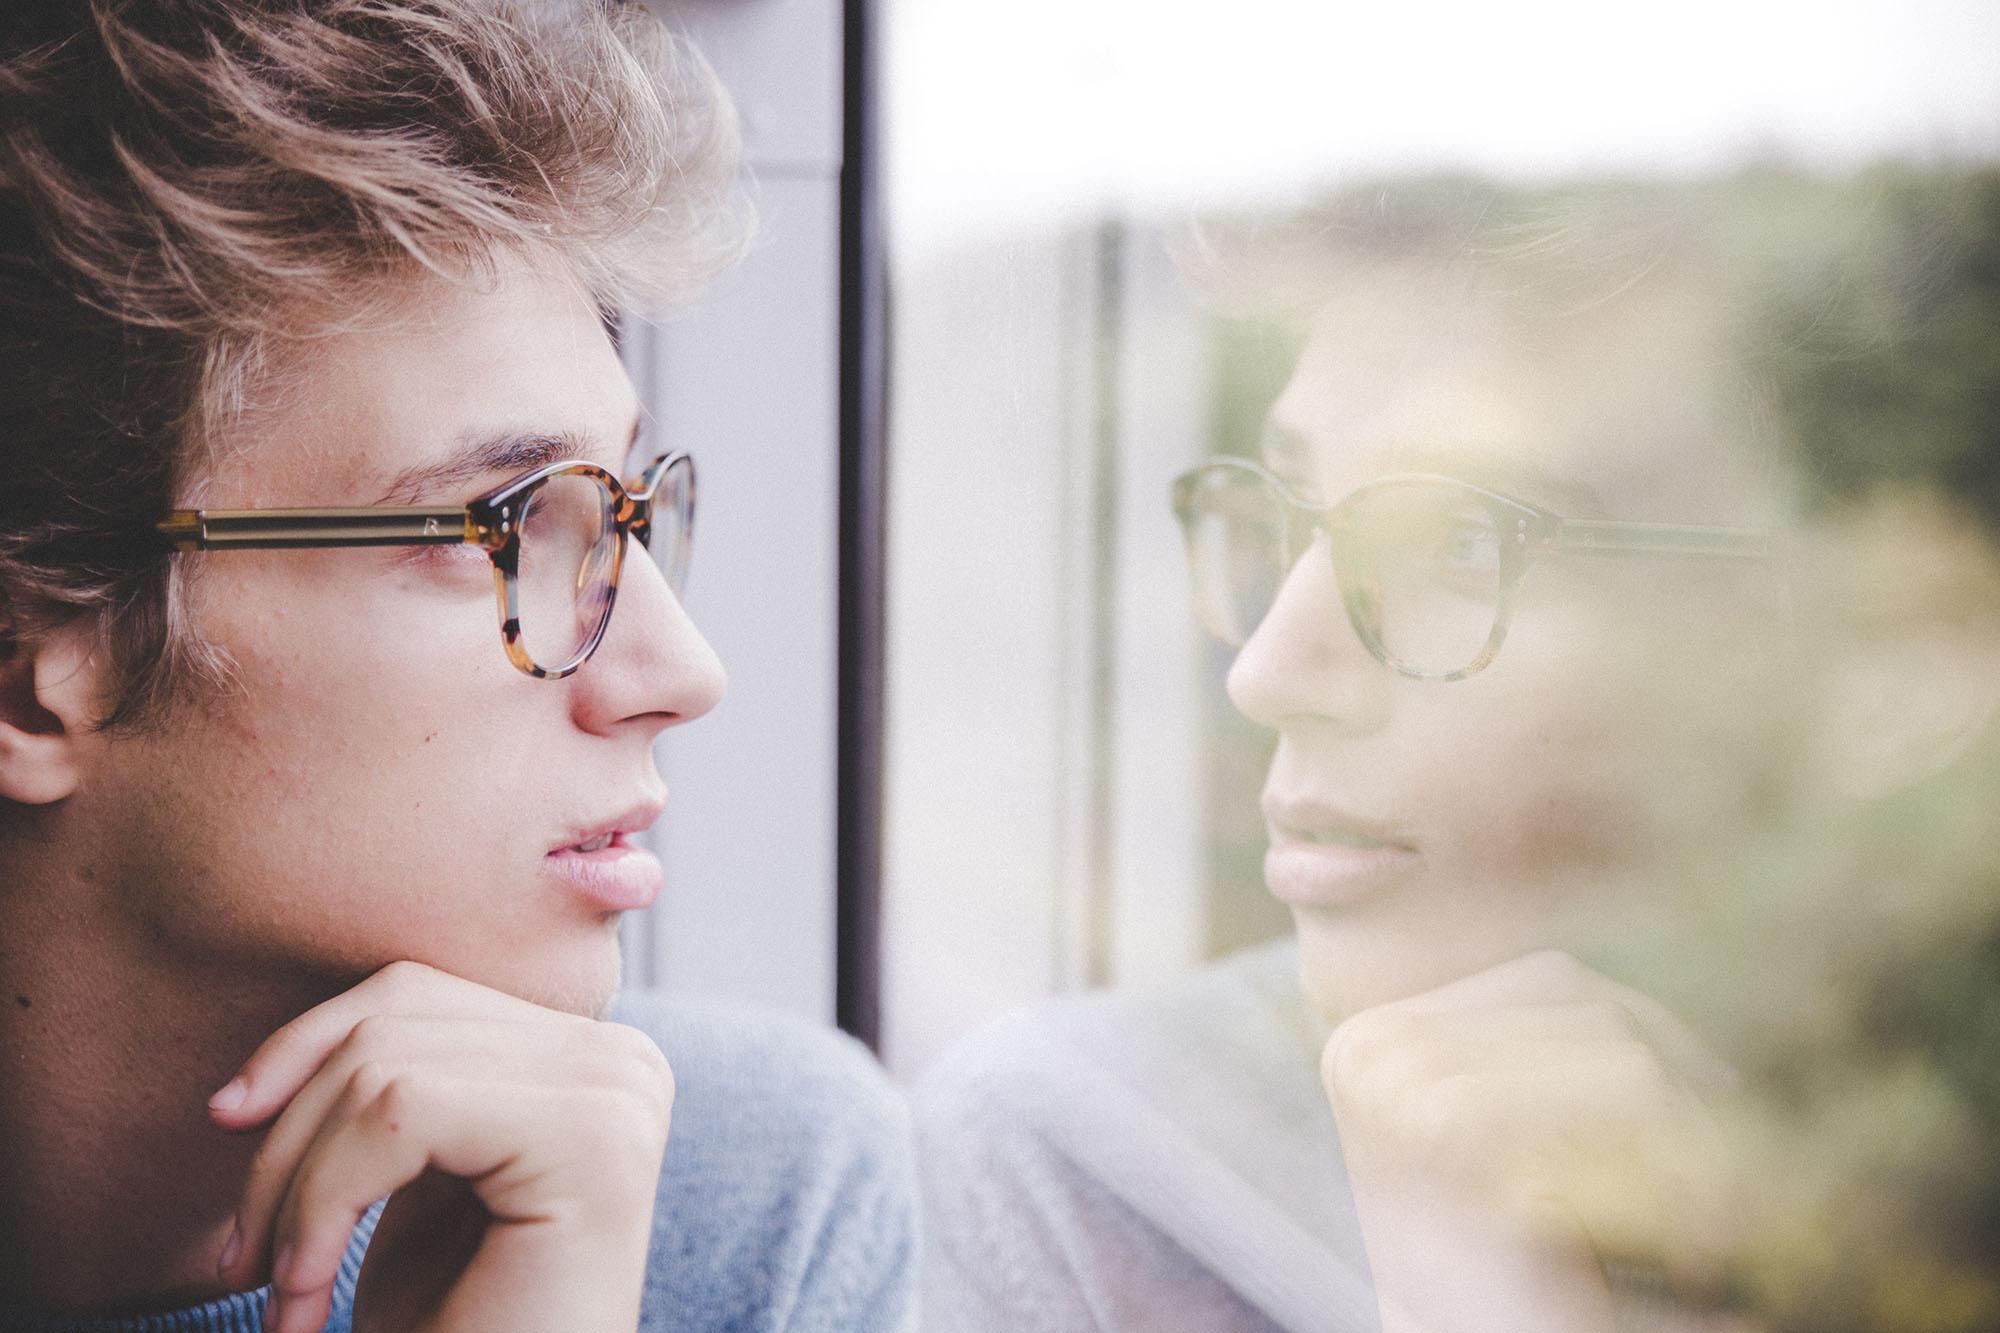 3 Reasons Leaders Stop Reflecting on Their Own Leadership